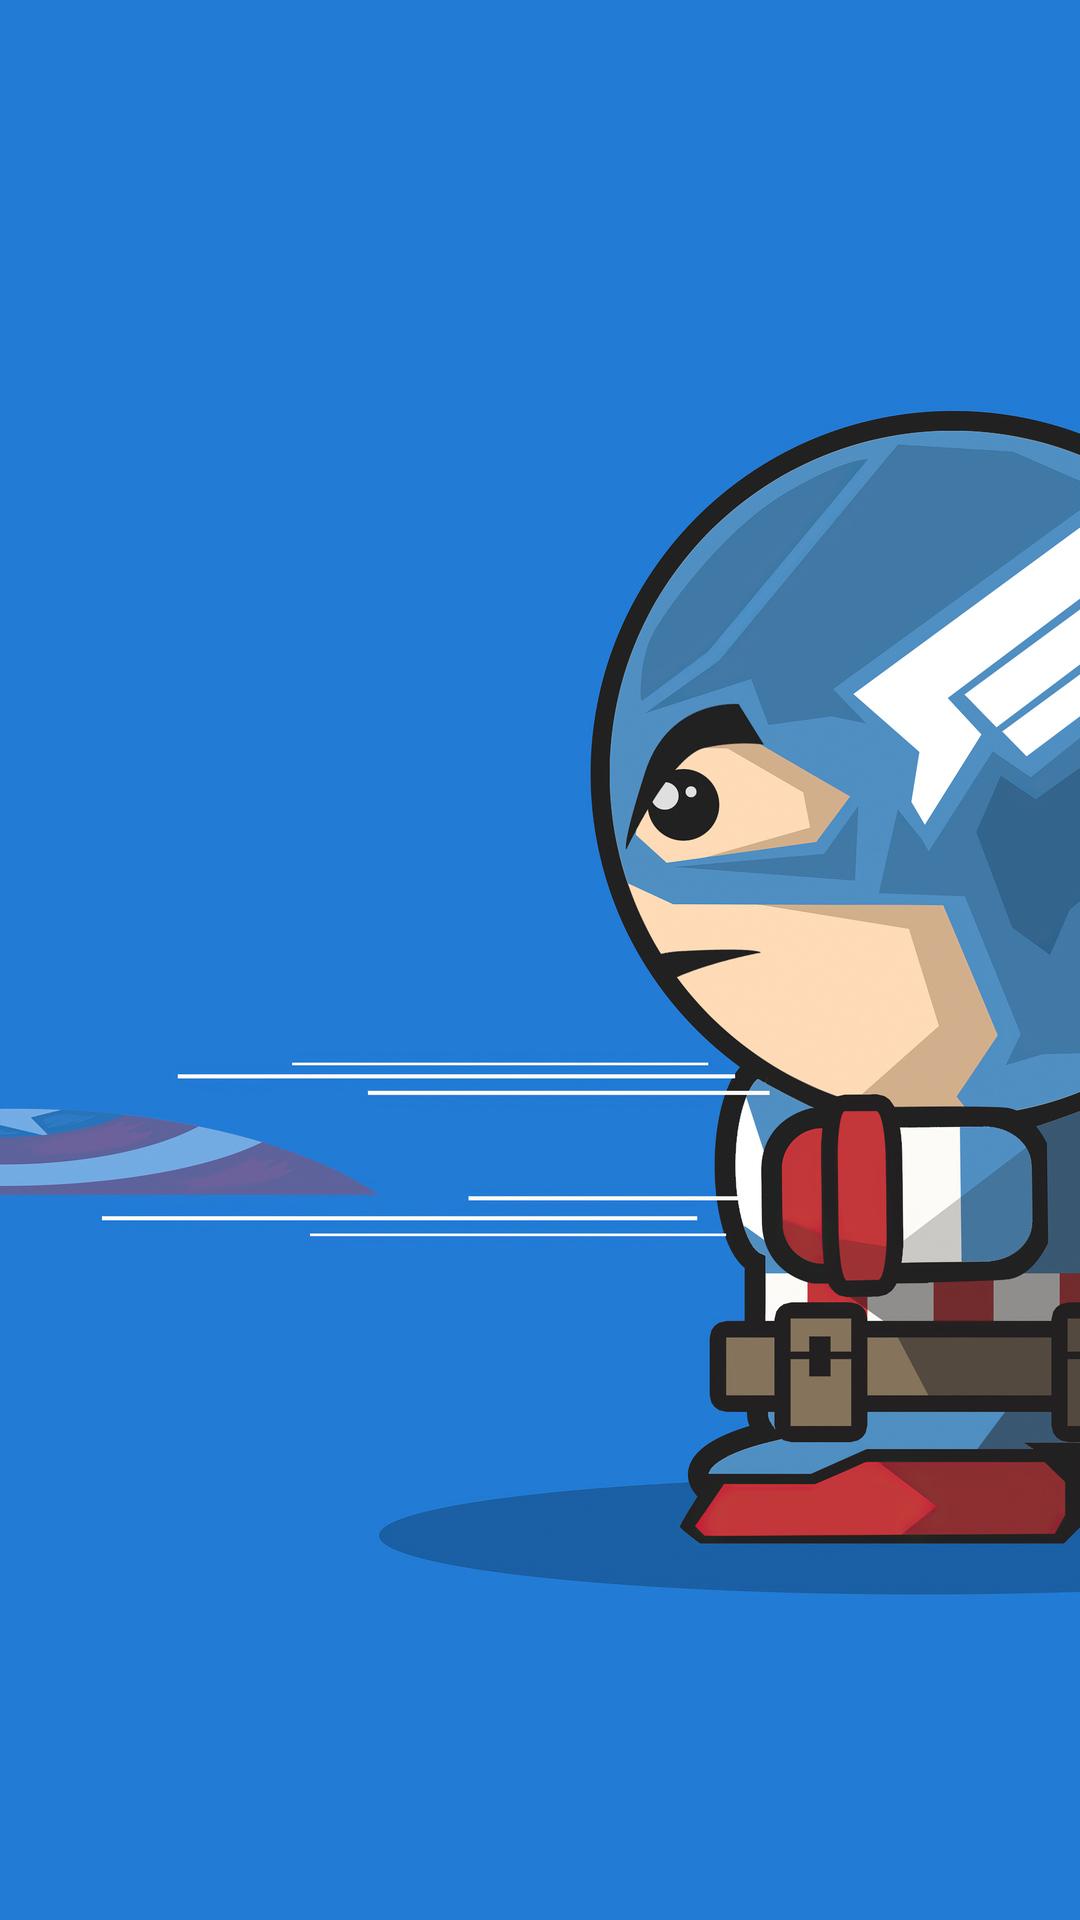 captain america cartoon minimal art 4k 3j 1080x1920 - Pack de Fondos de Pantalla Minimalistas (+100 Imagenes)